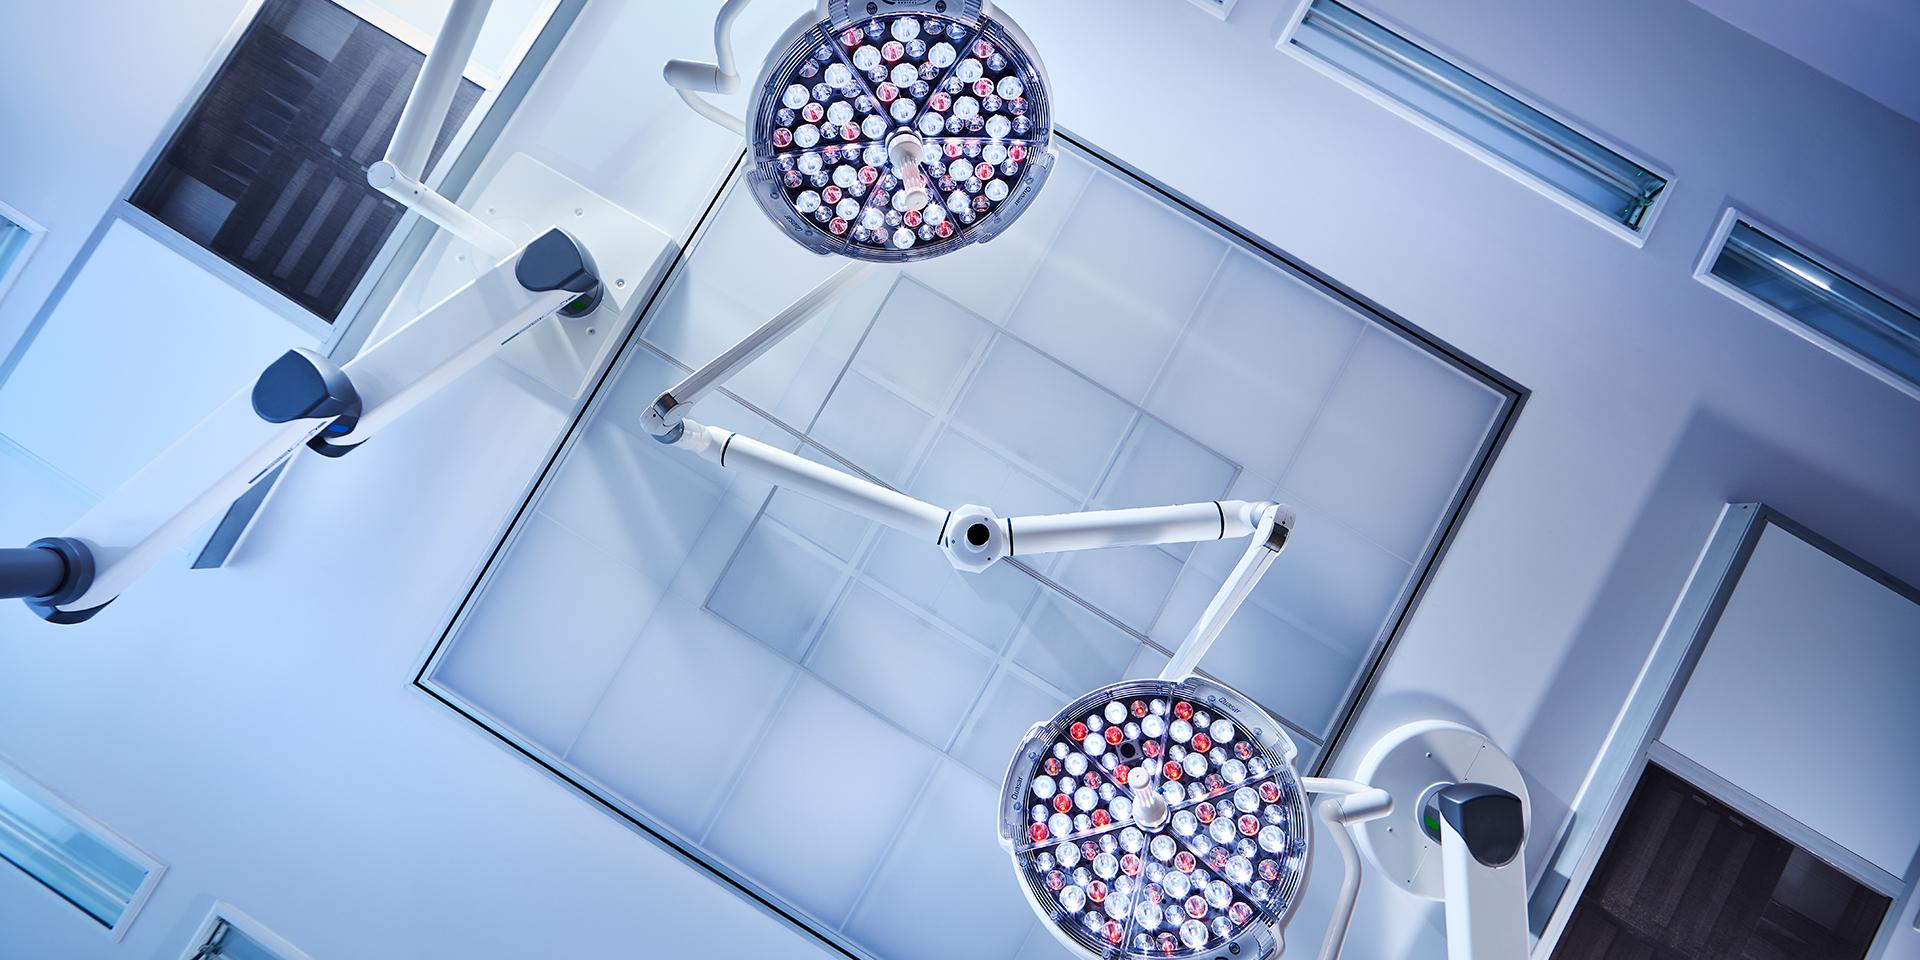 ultraclean-ventilation-canopy-hero